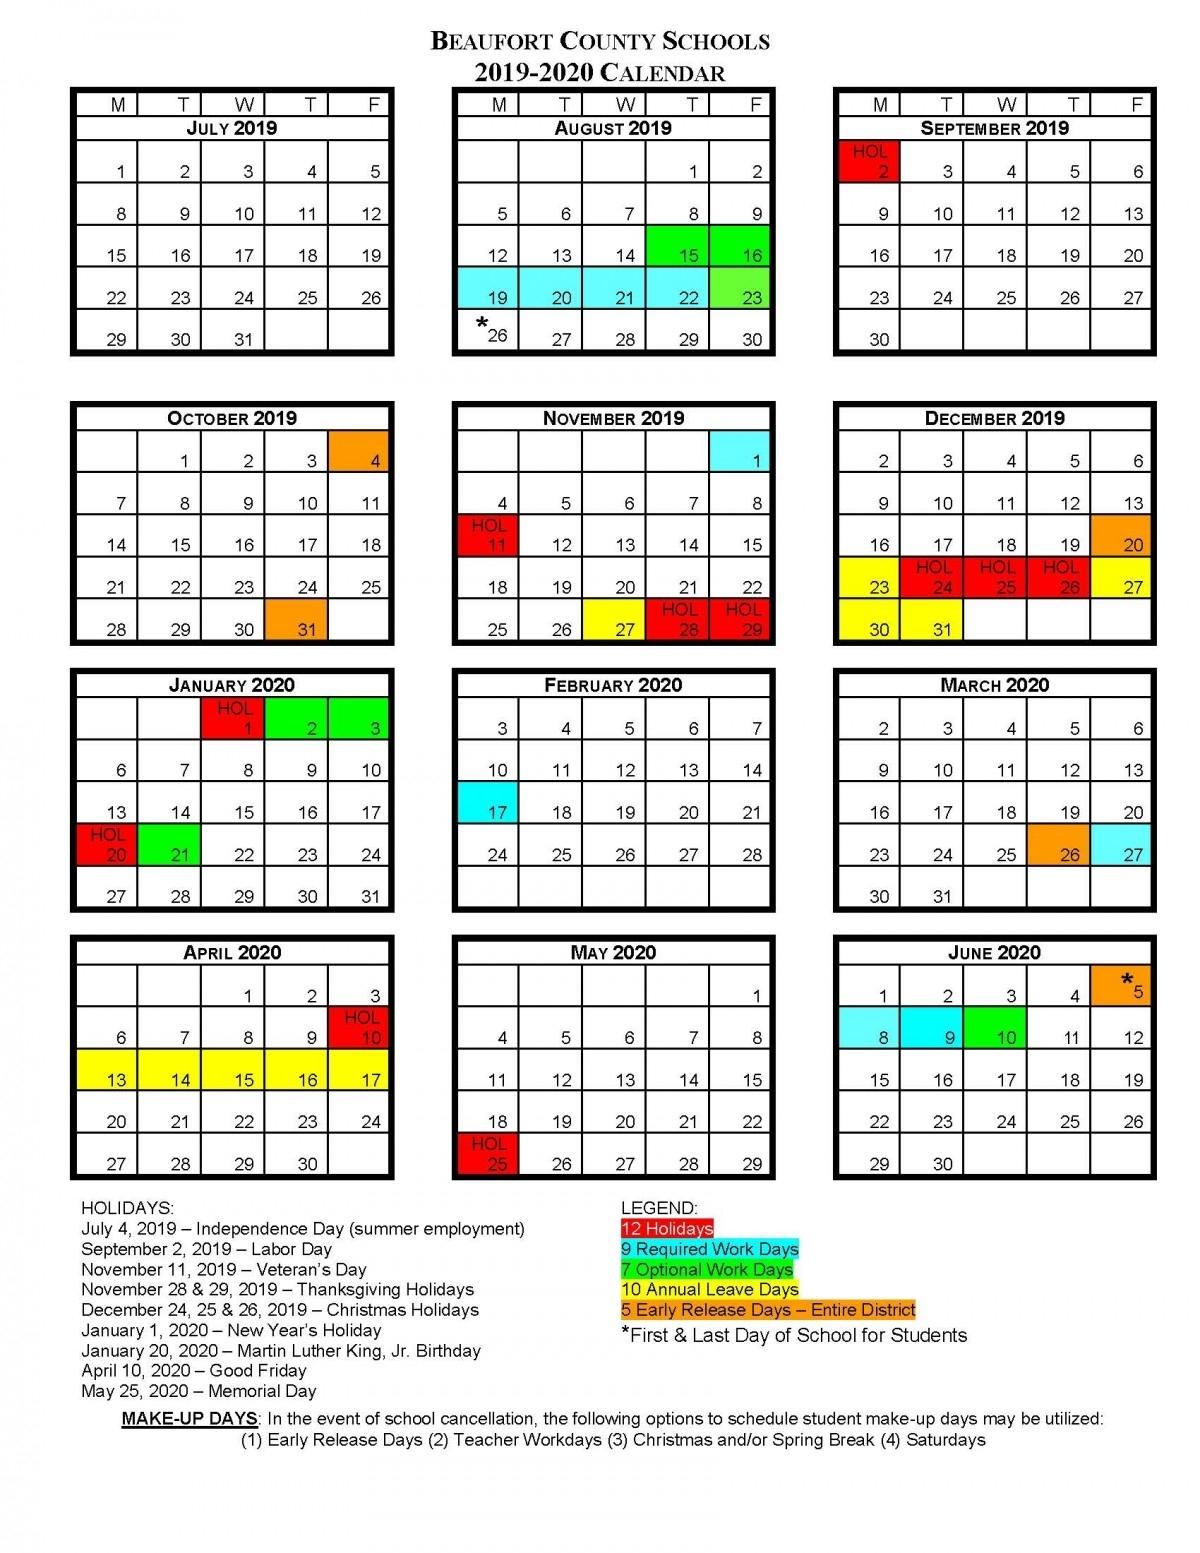 Bcs School Calendar | Beaufort County Schools in Unit 4 Calendar 2019-2020